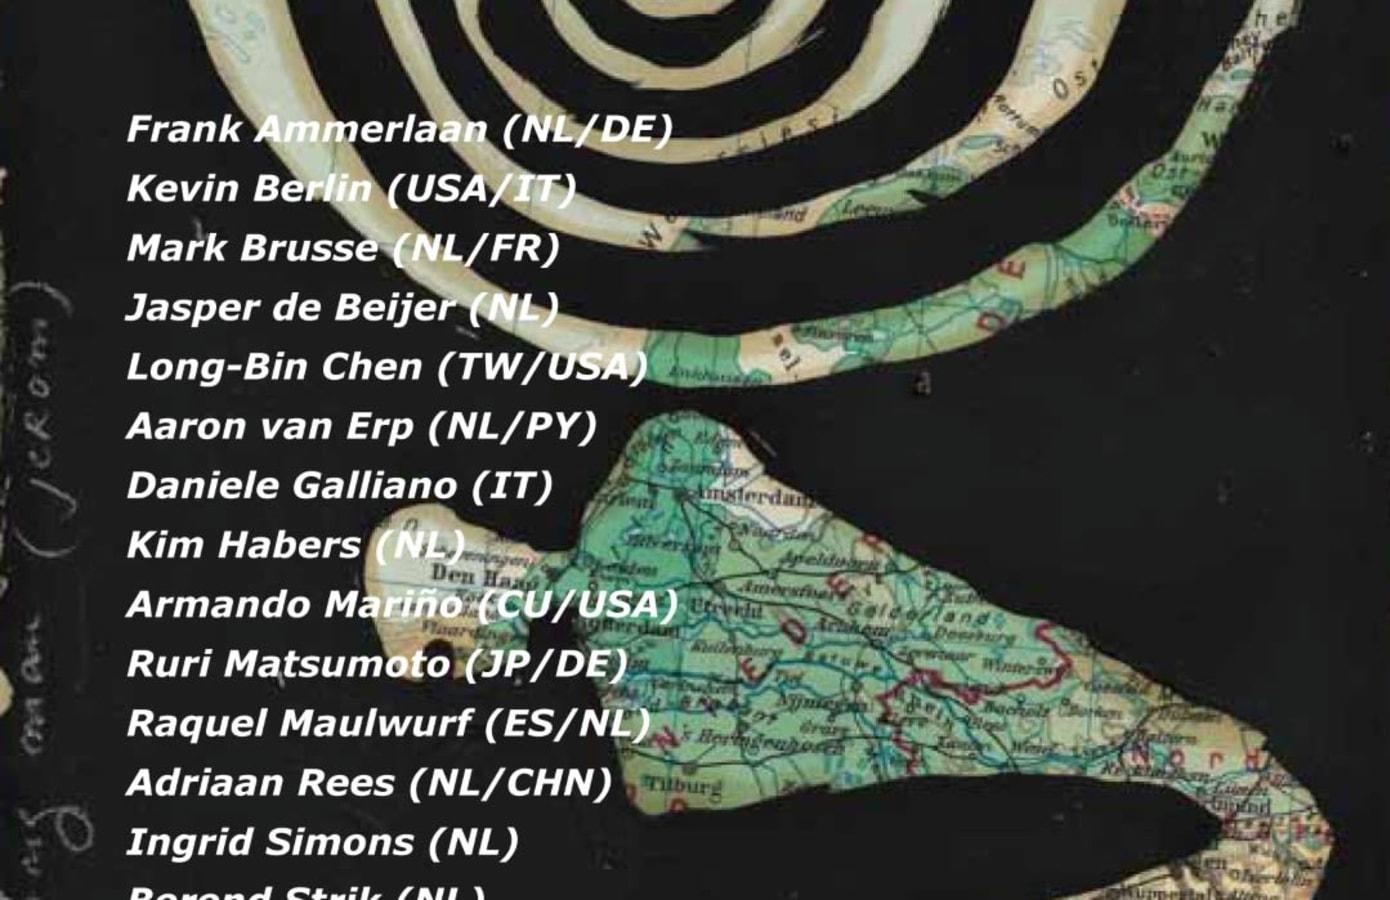 Five Years Livingstone Projects Berlin, Aaron van Erp, Adriaan Rees, Berend Strik, Daniele Galliano, Hugo Tieleman, Ingrid Simons, Jan Wattjes, Raquel Maulwurf, Ruri Matsumoto,